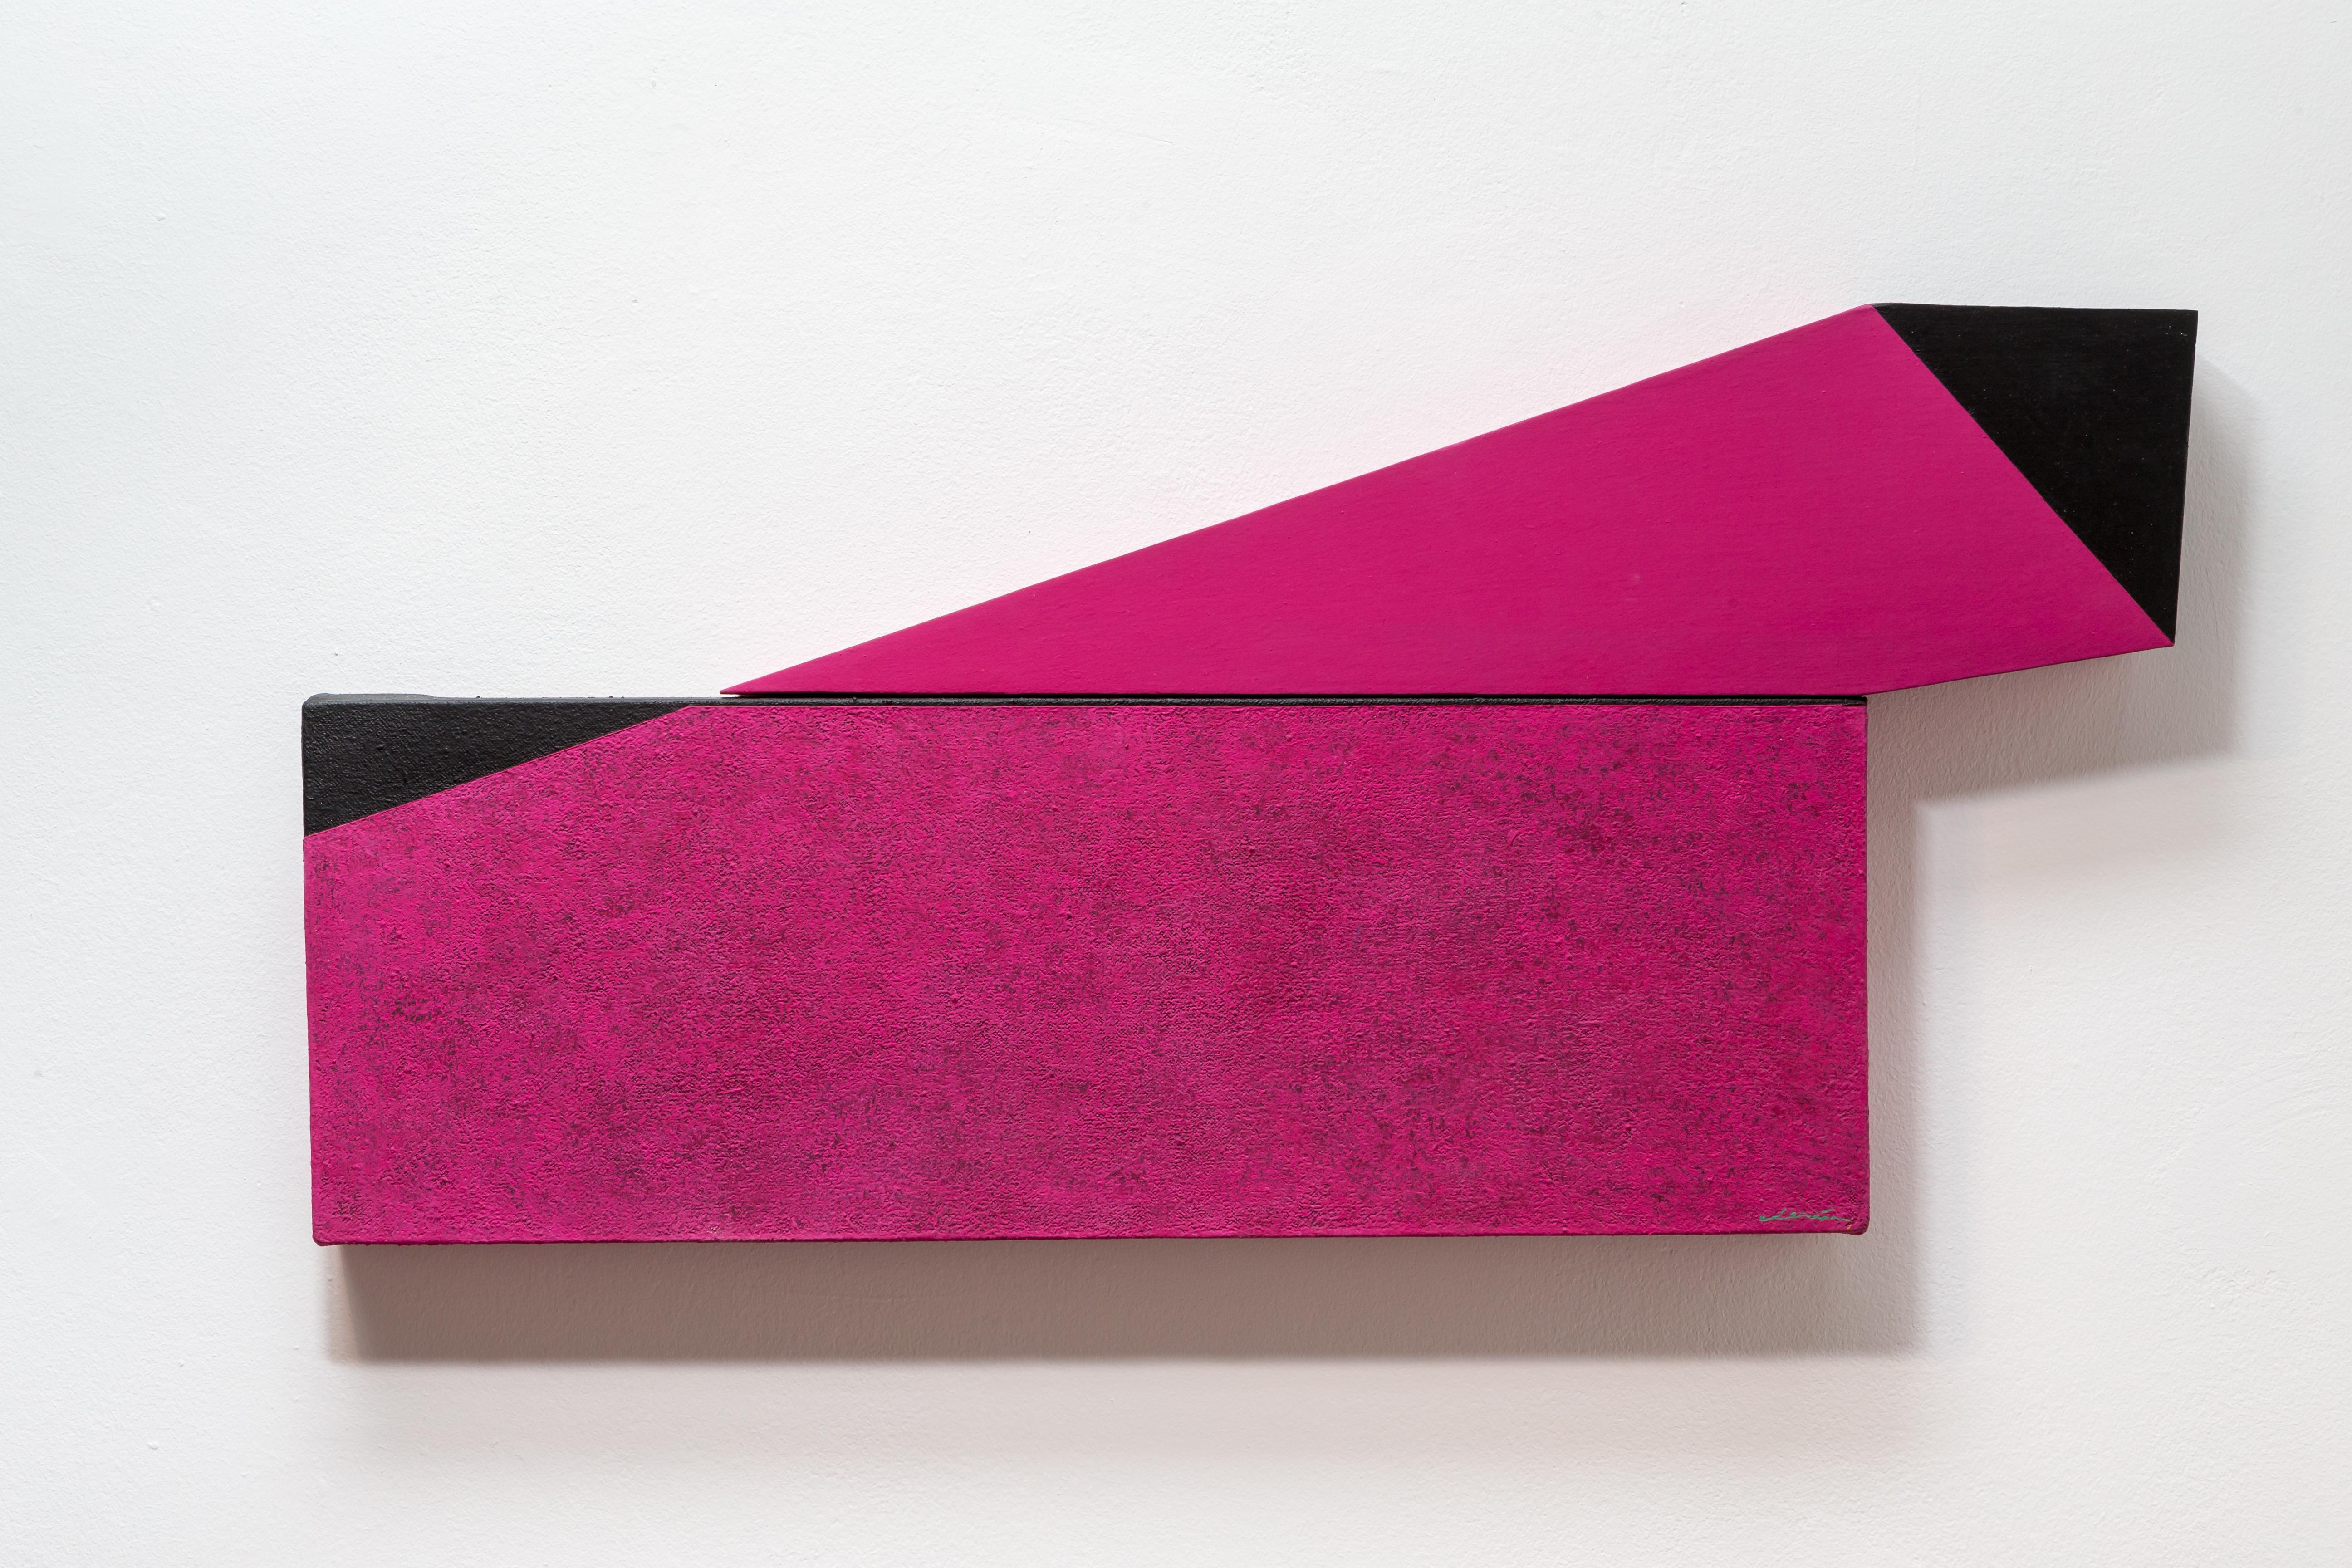 Projected Magenta (Series Irregulars II) by Spanish artist, Silvia Lerin